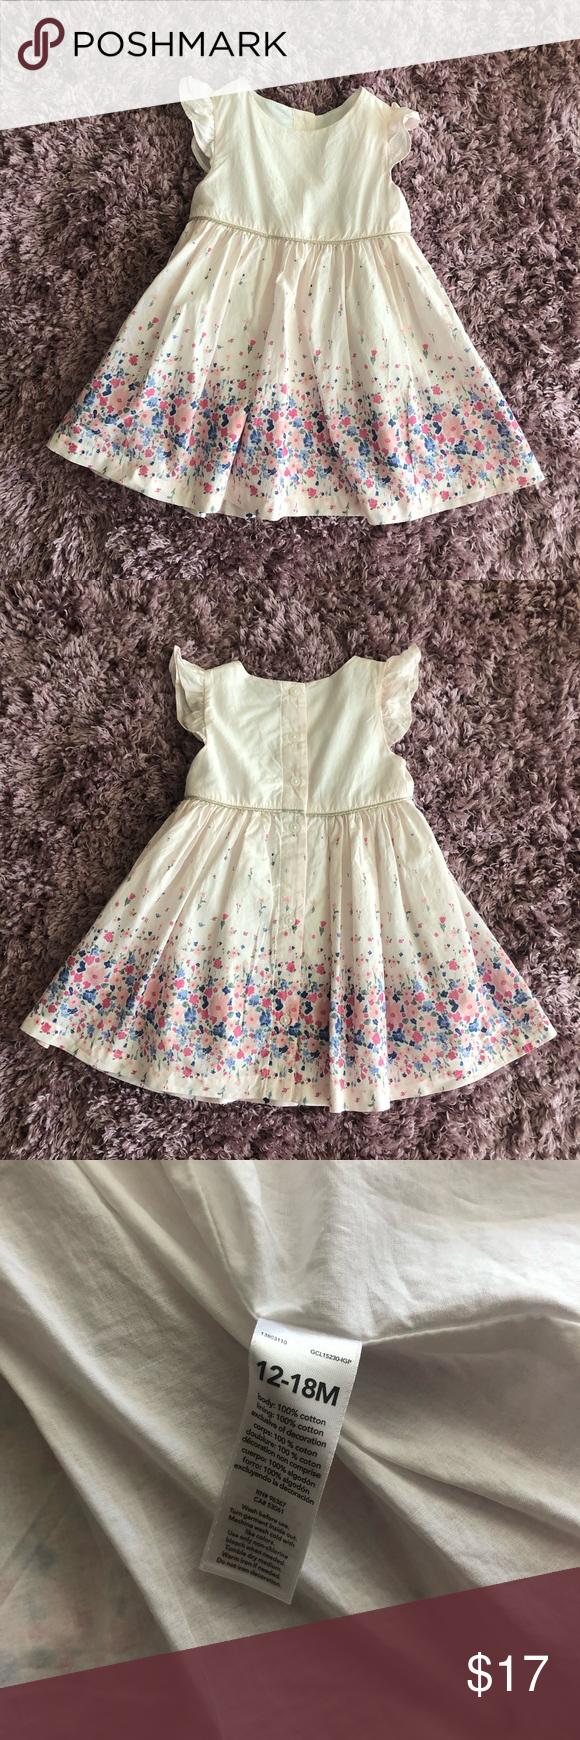 Zara Summer Dress Size 12 18m Beautiful Baby Girl Dresses Summer Dresses Zara Summer Dress [ 1740 x 580 Pixel ]